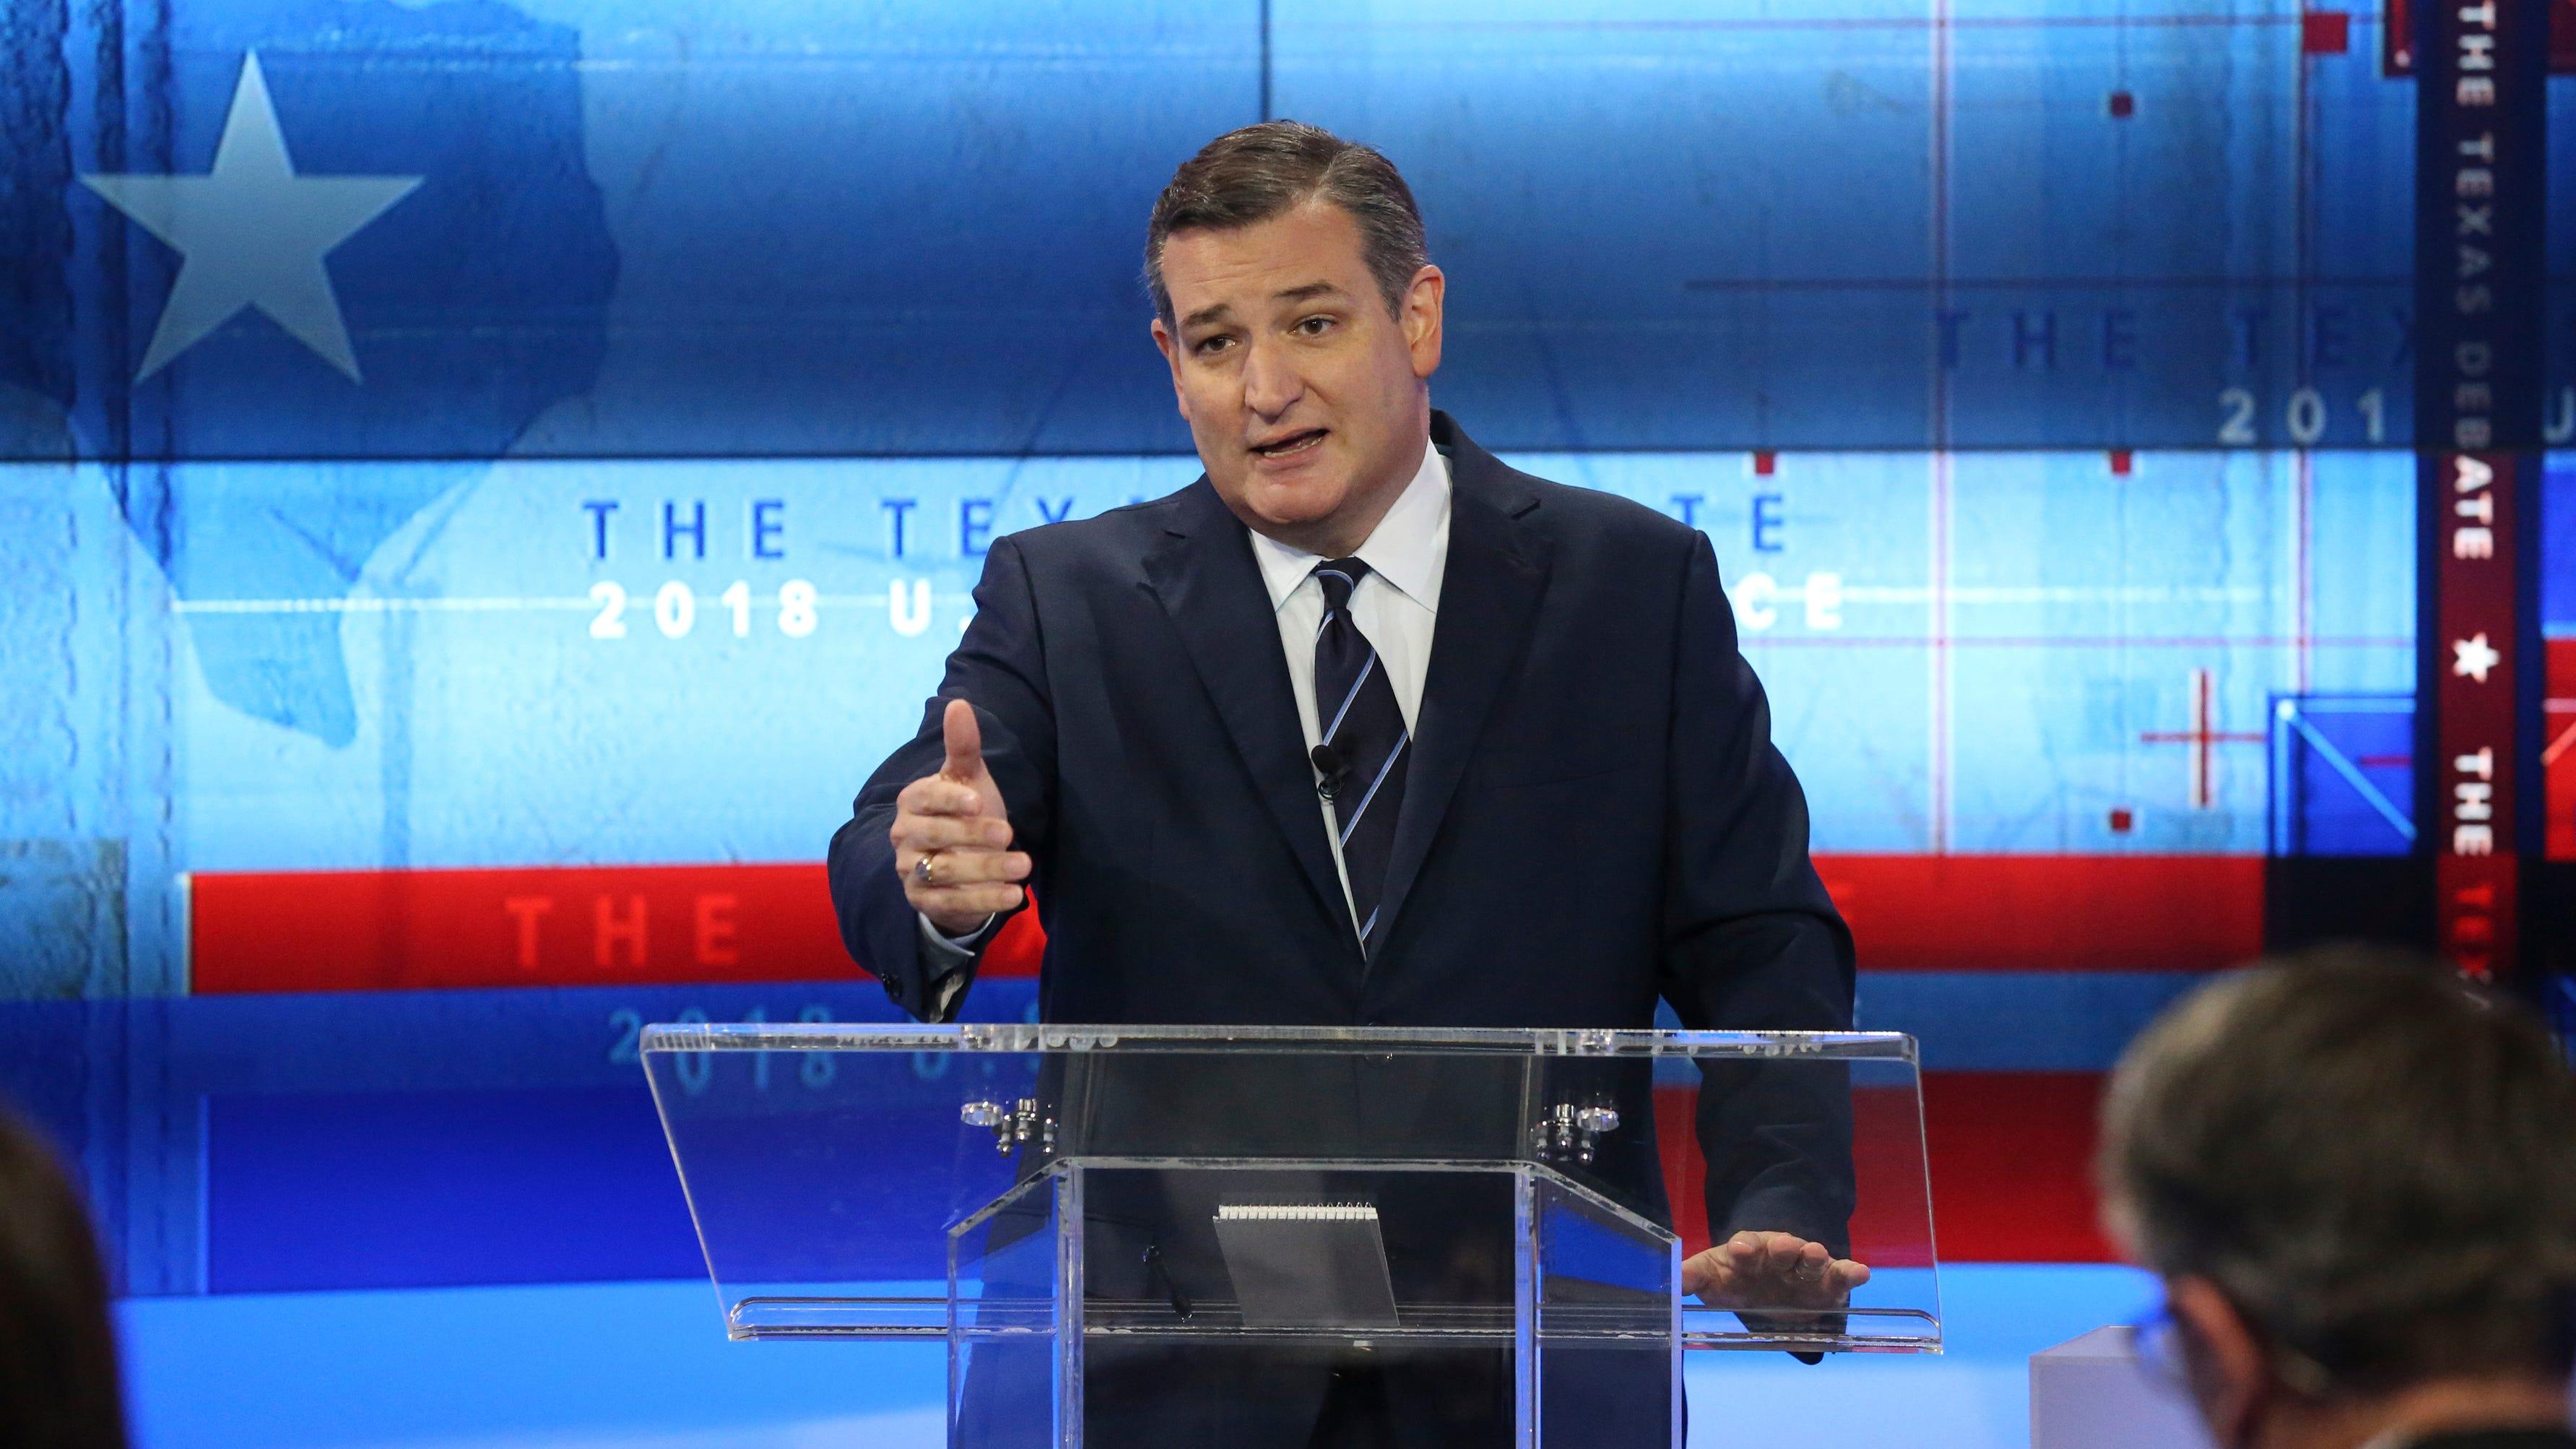 U.S. Sen. Ted Cruz, R-Texas, takes part in a debate for a Texas U.S. Senate seat with U.S. Rep. Beto O'Rourke, D-El Paso, on Tuesday, Oct. 16, 2018, in San Antonio.